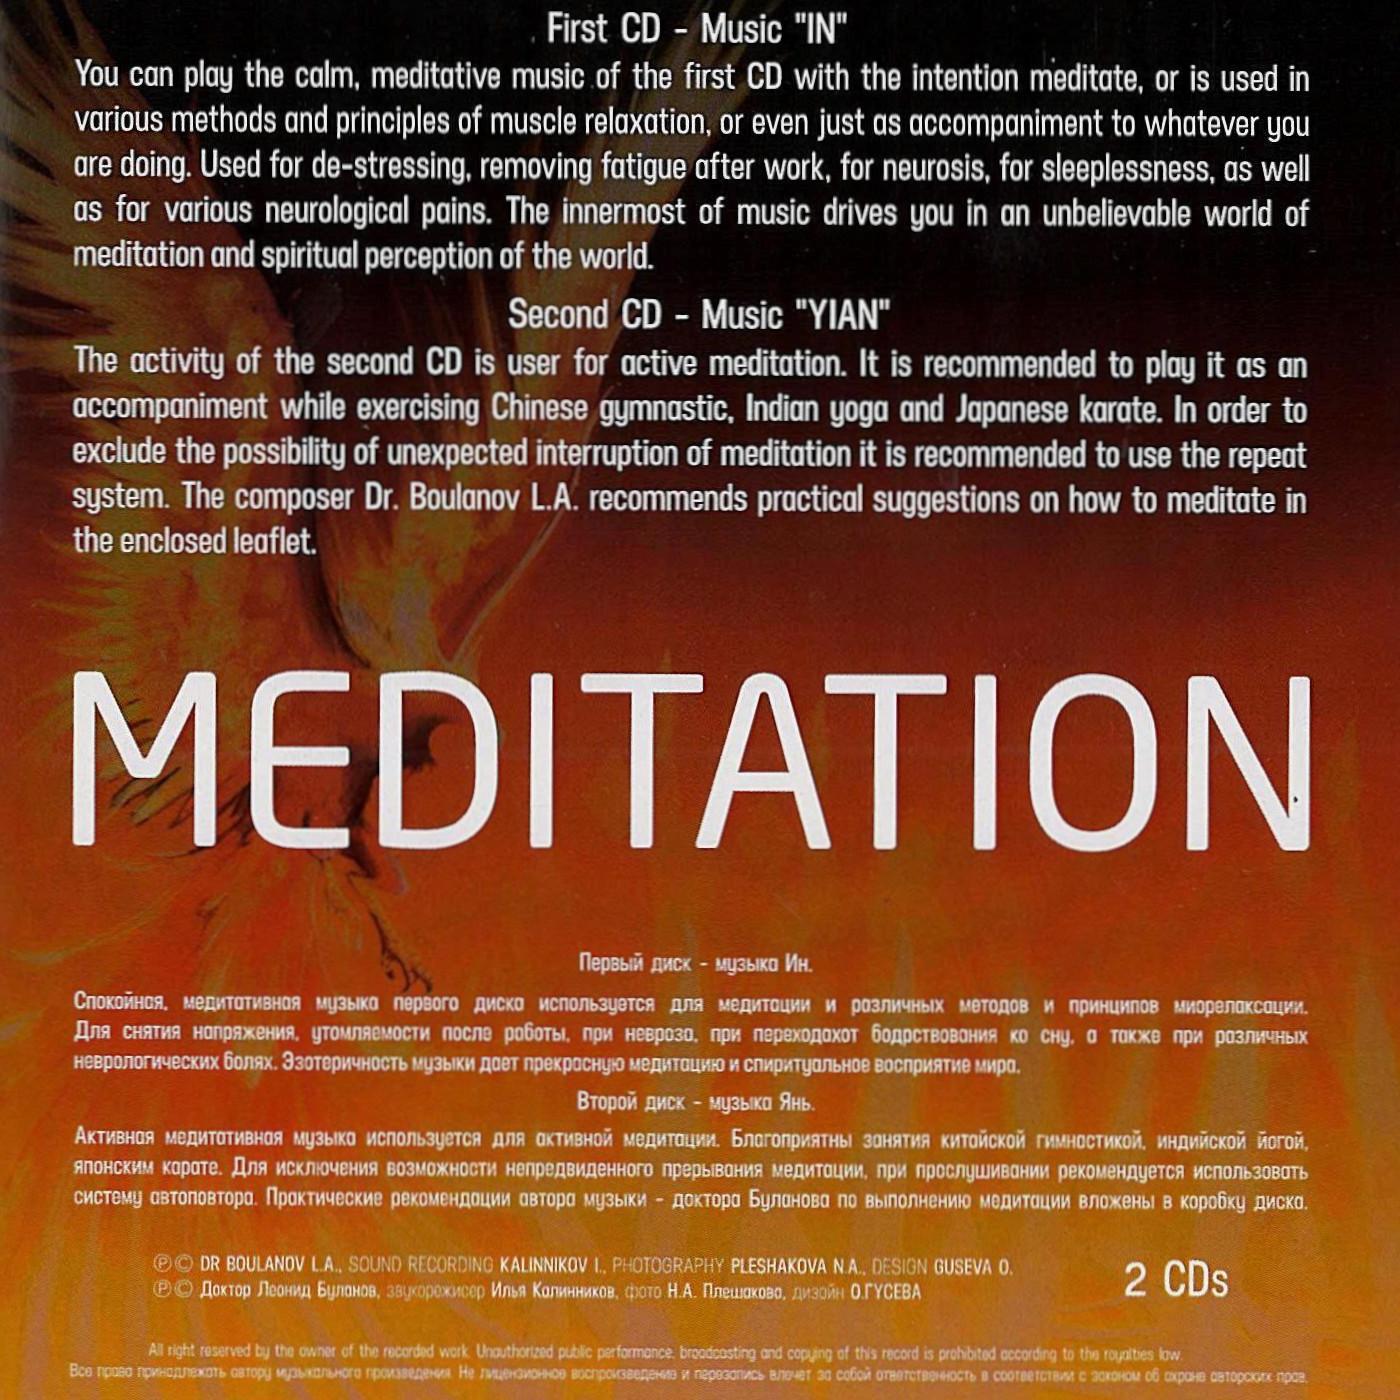 медитация-0001.jpg